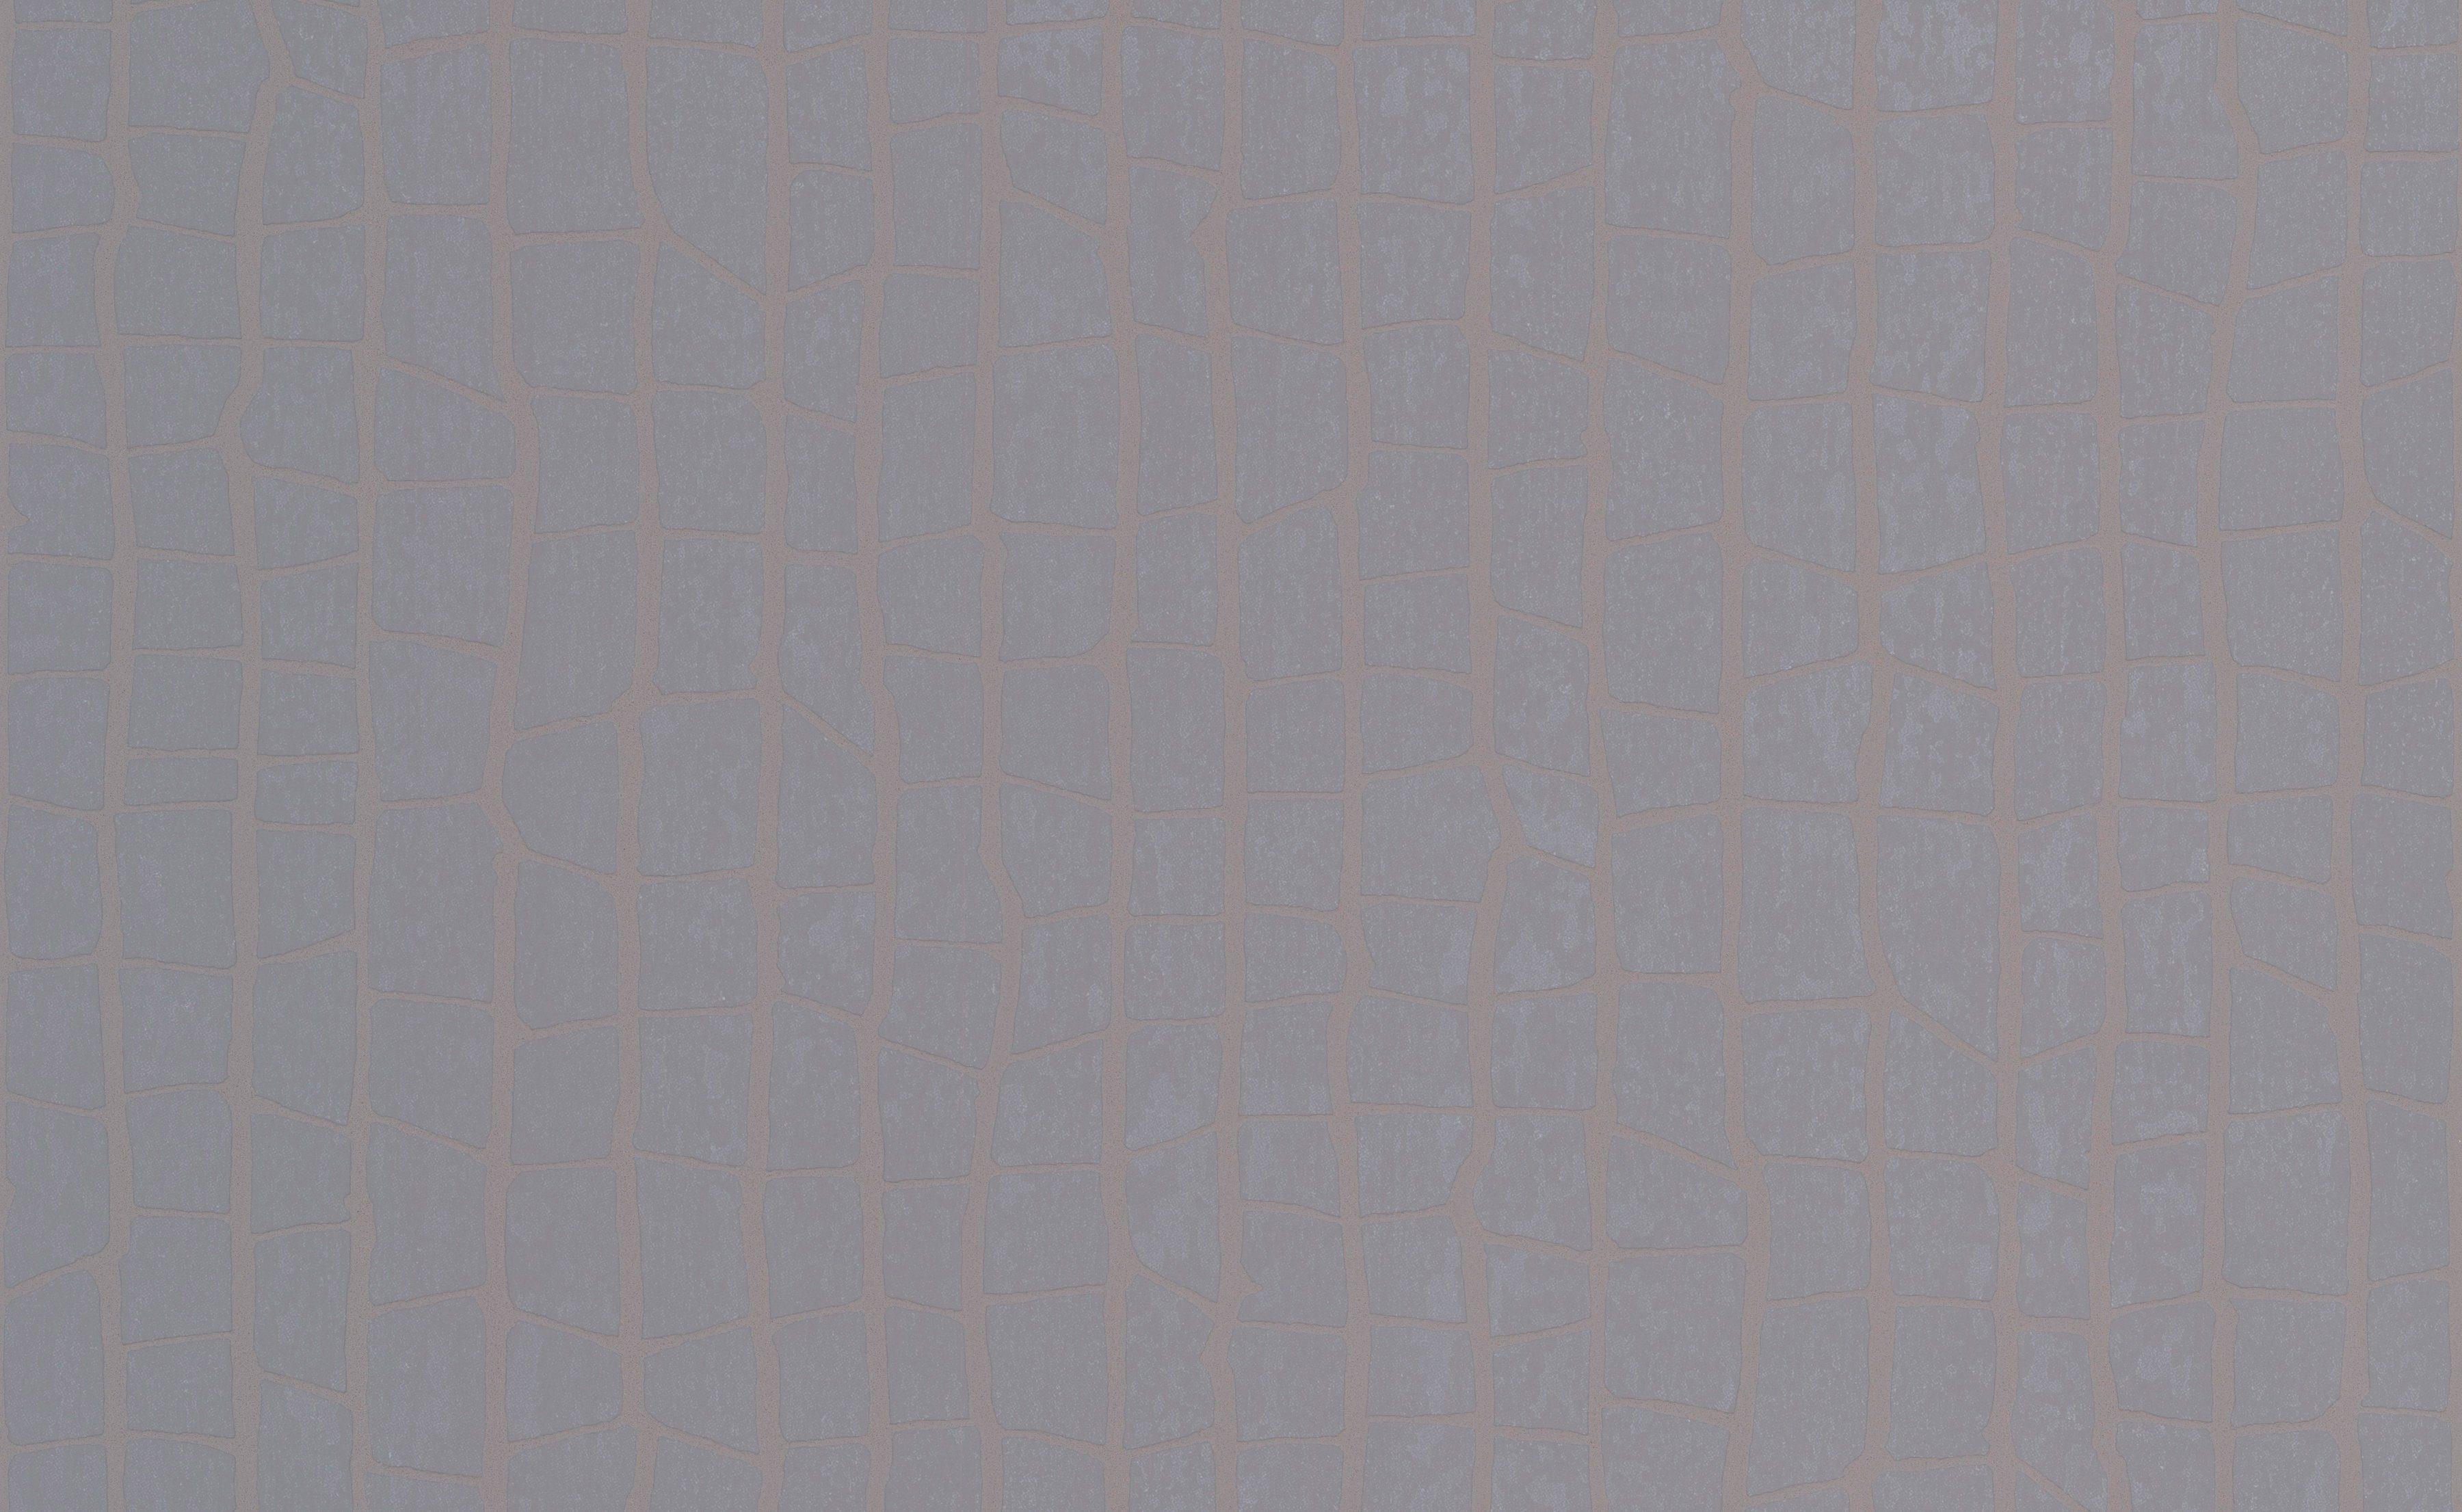 Vliestapete »Savanna«, dunkelgrau